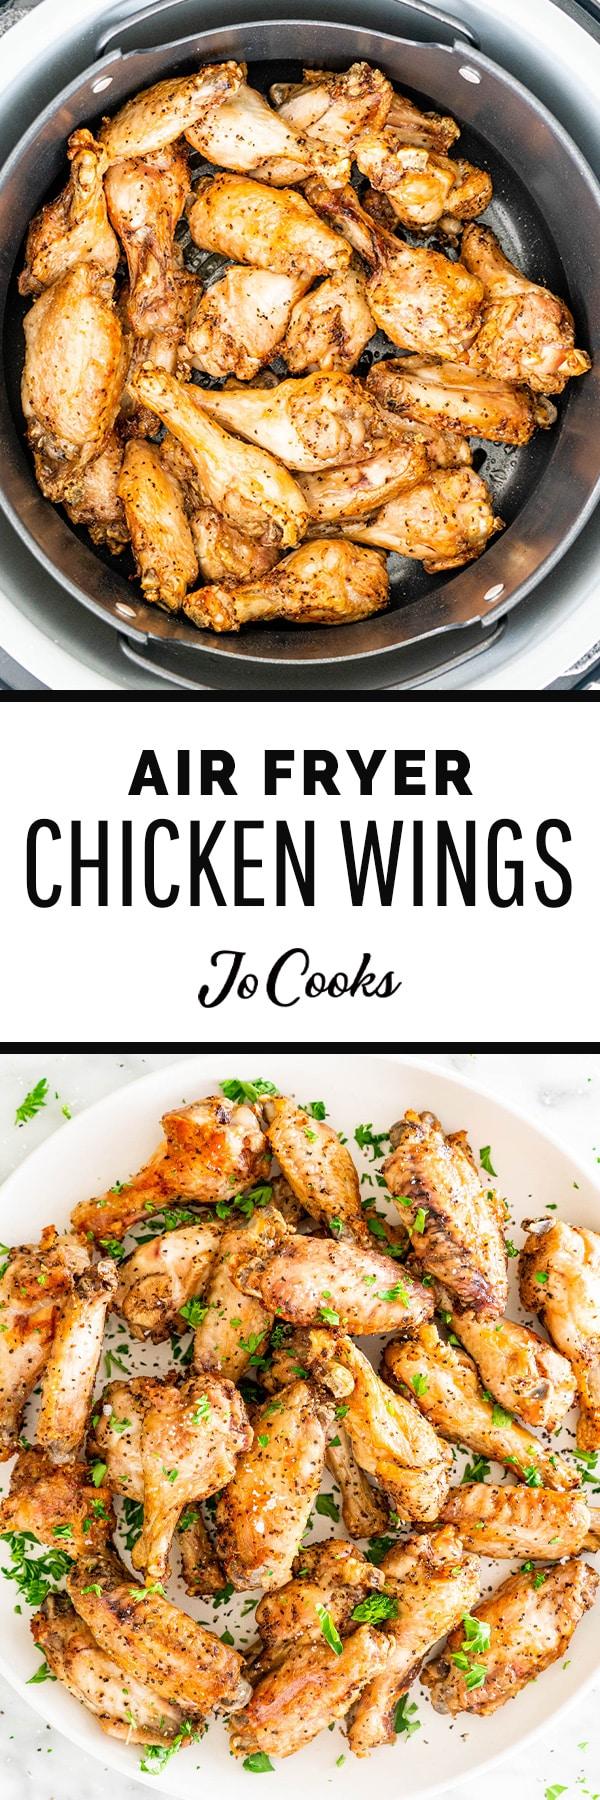 ninja air fryer chicken wings recipe